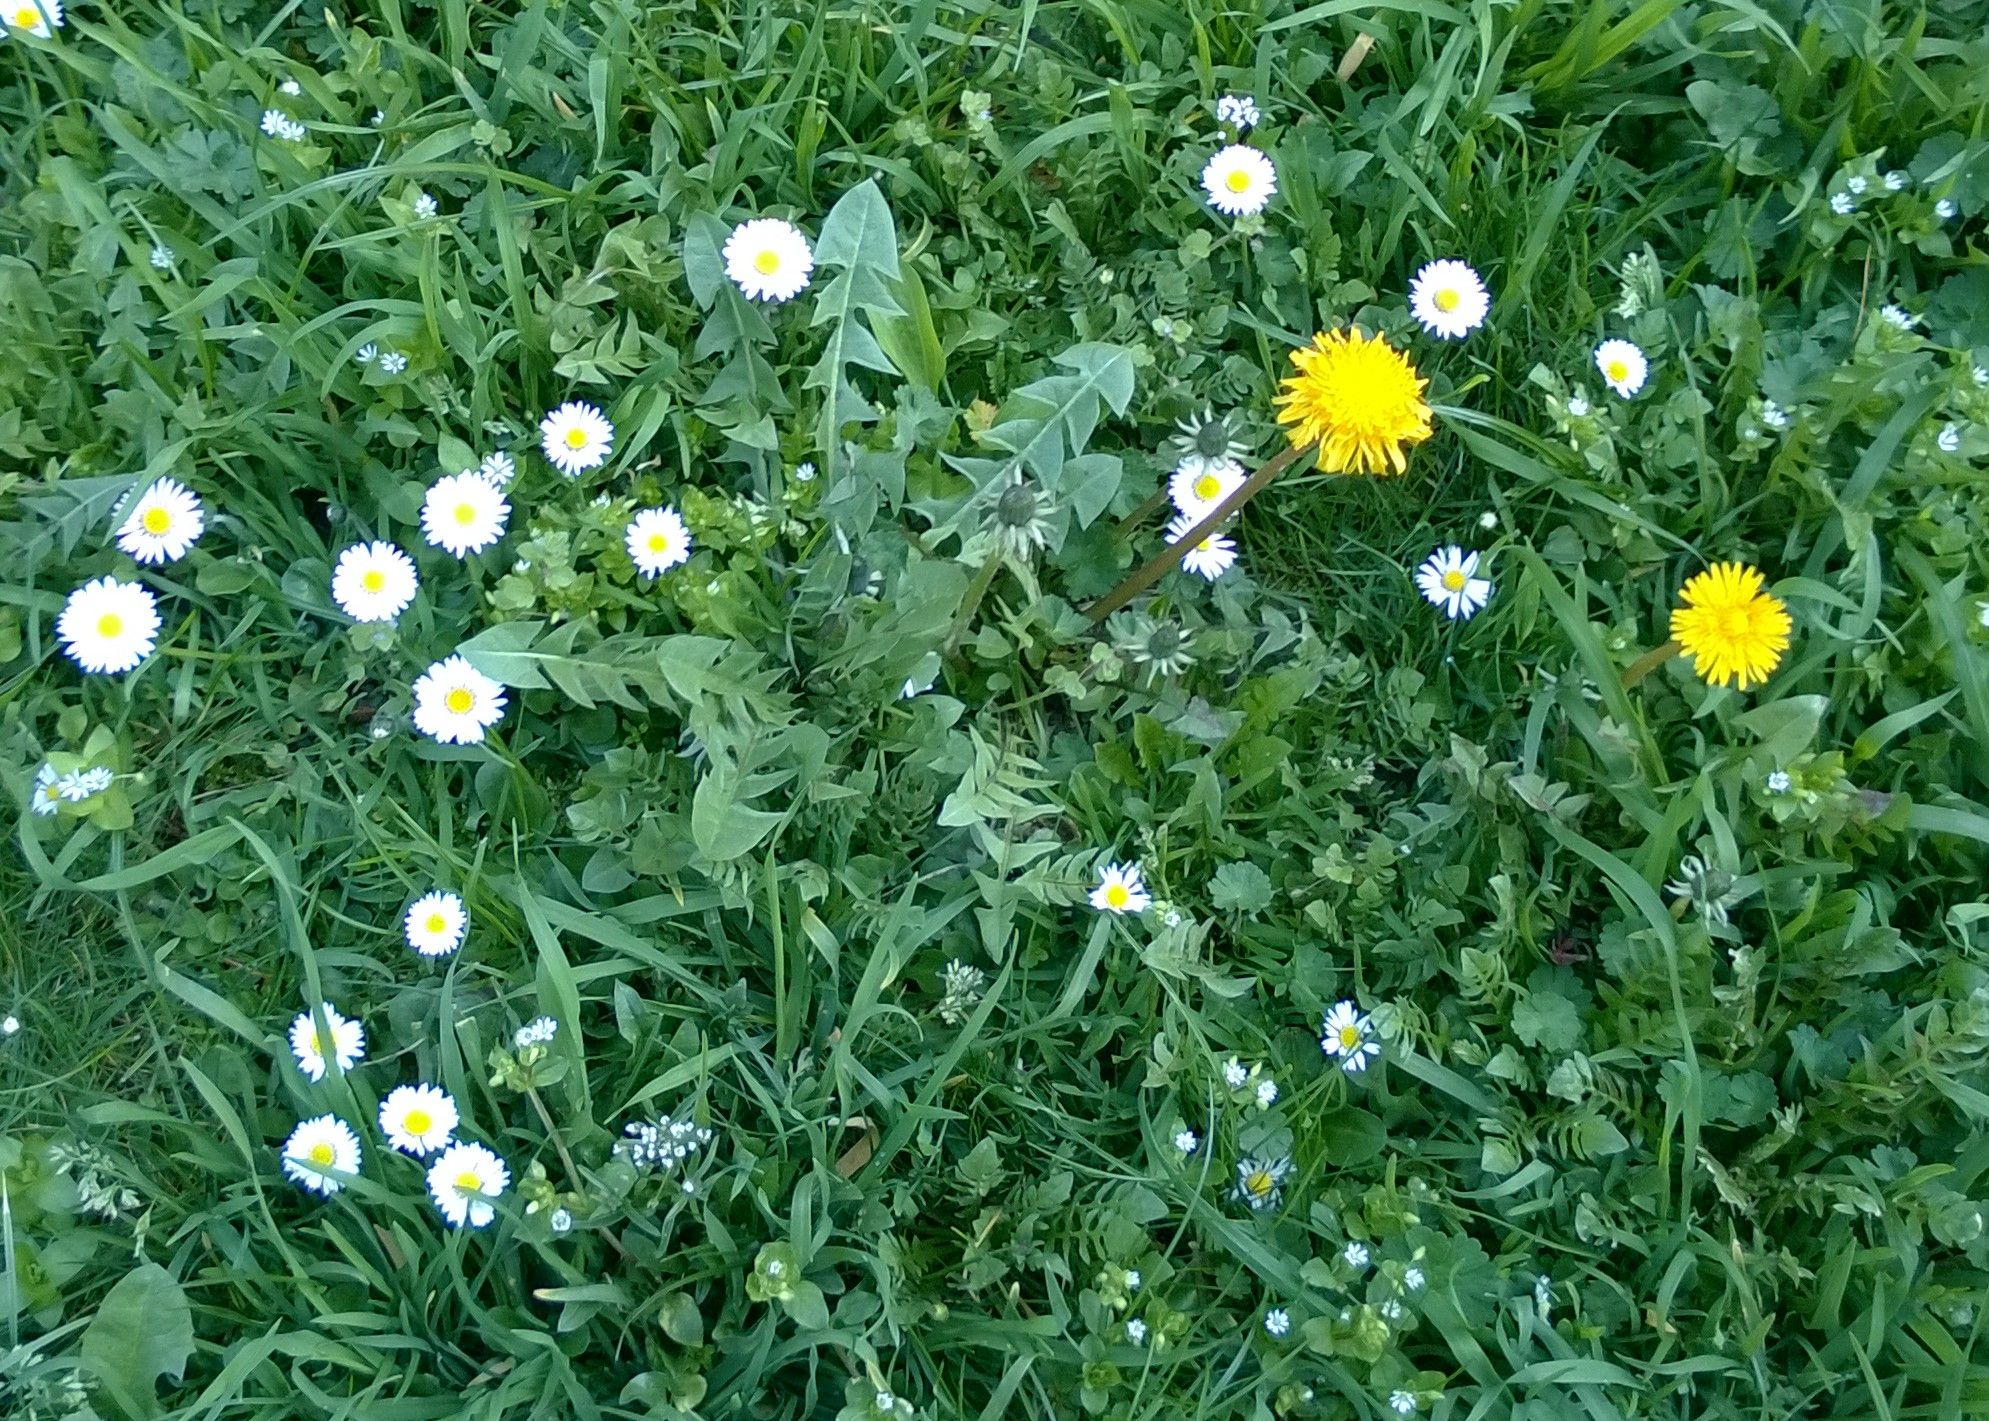 Tavaszi virágözön